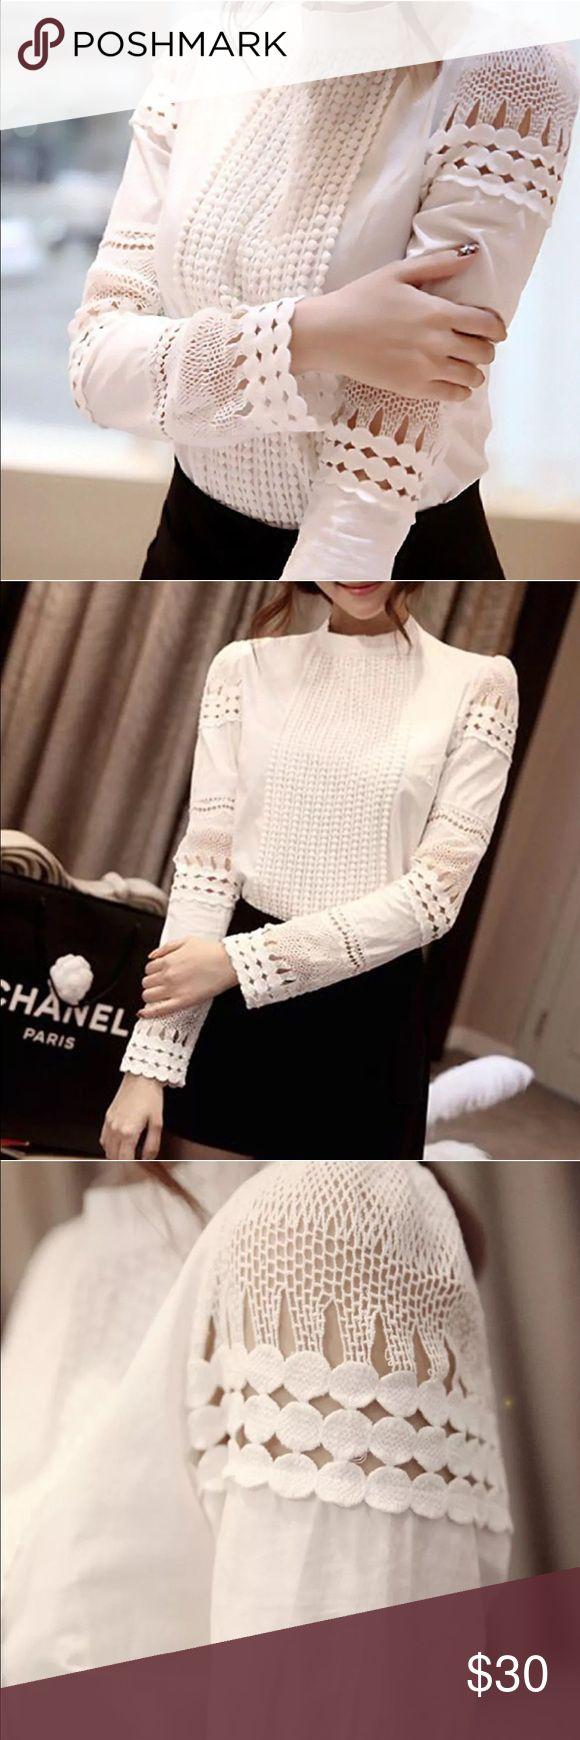 Fit USA Meduim USA  Lace Crochet High Collar XXL Fits more like Medium USA  Fashion Women New Lace Crochet High Collar Blouse Casual Long-sleeve Shirt Tops XXL Tops Blouses